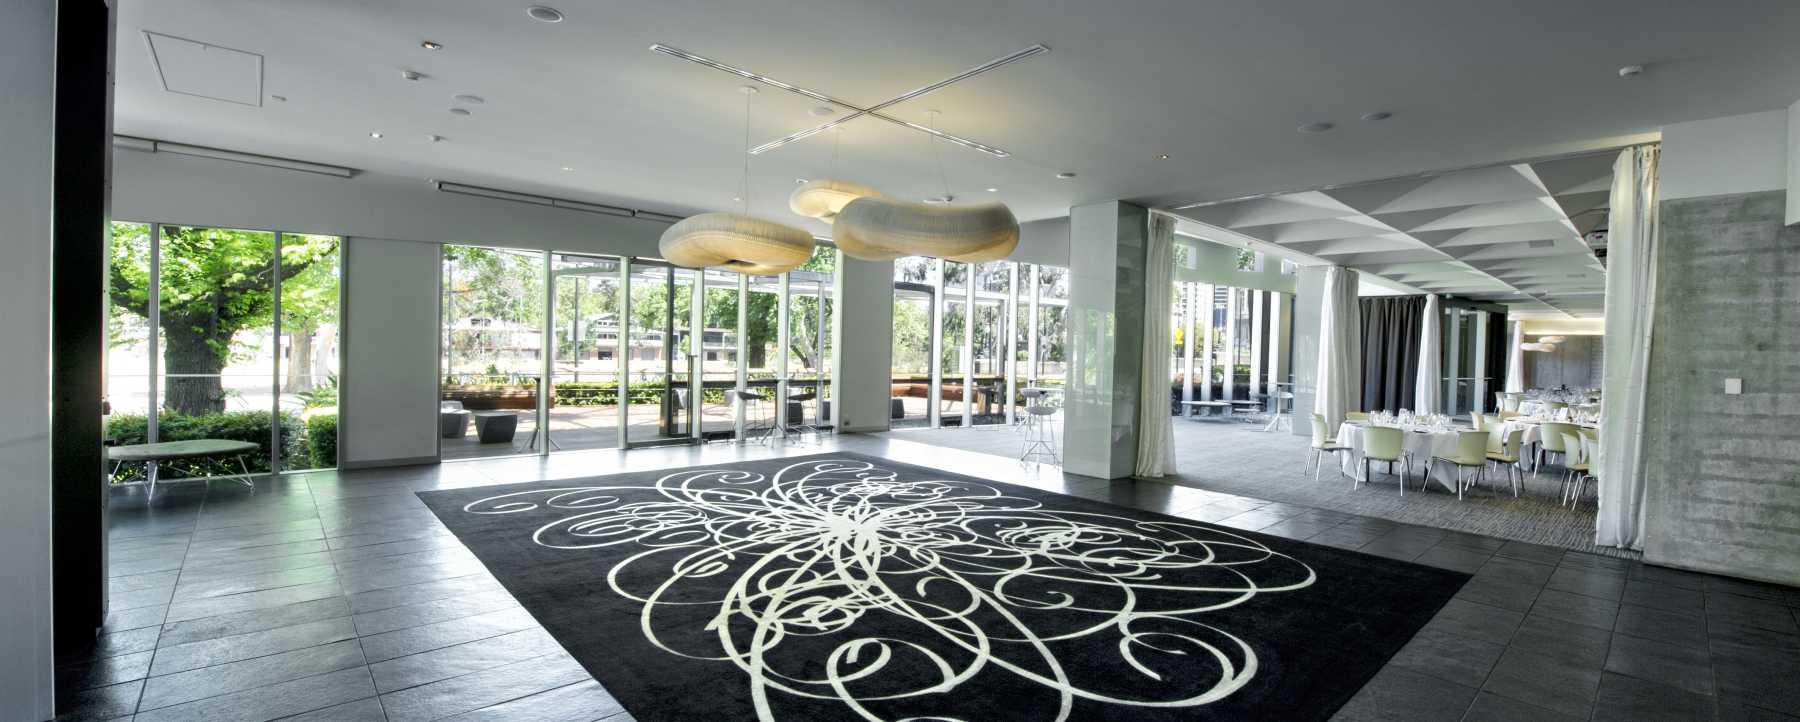 ZINC foyer